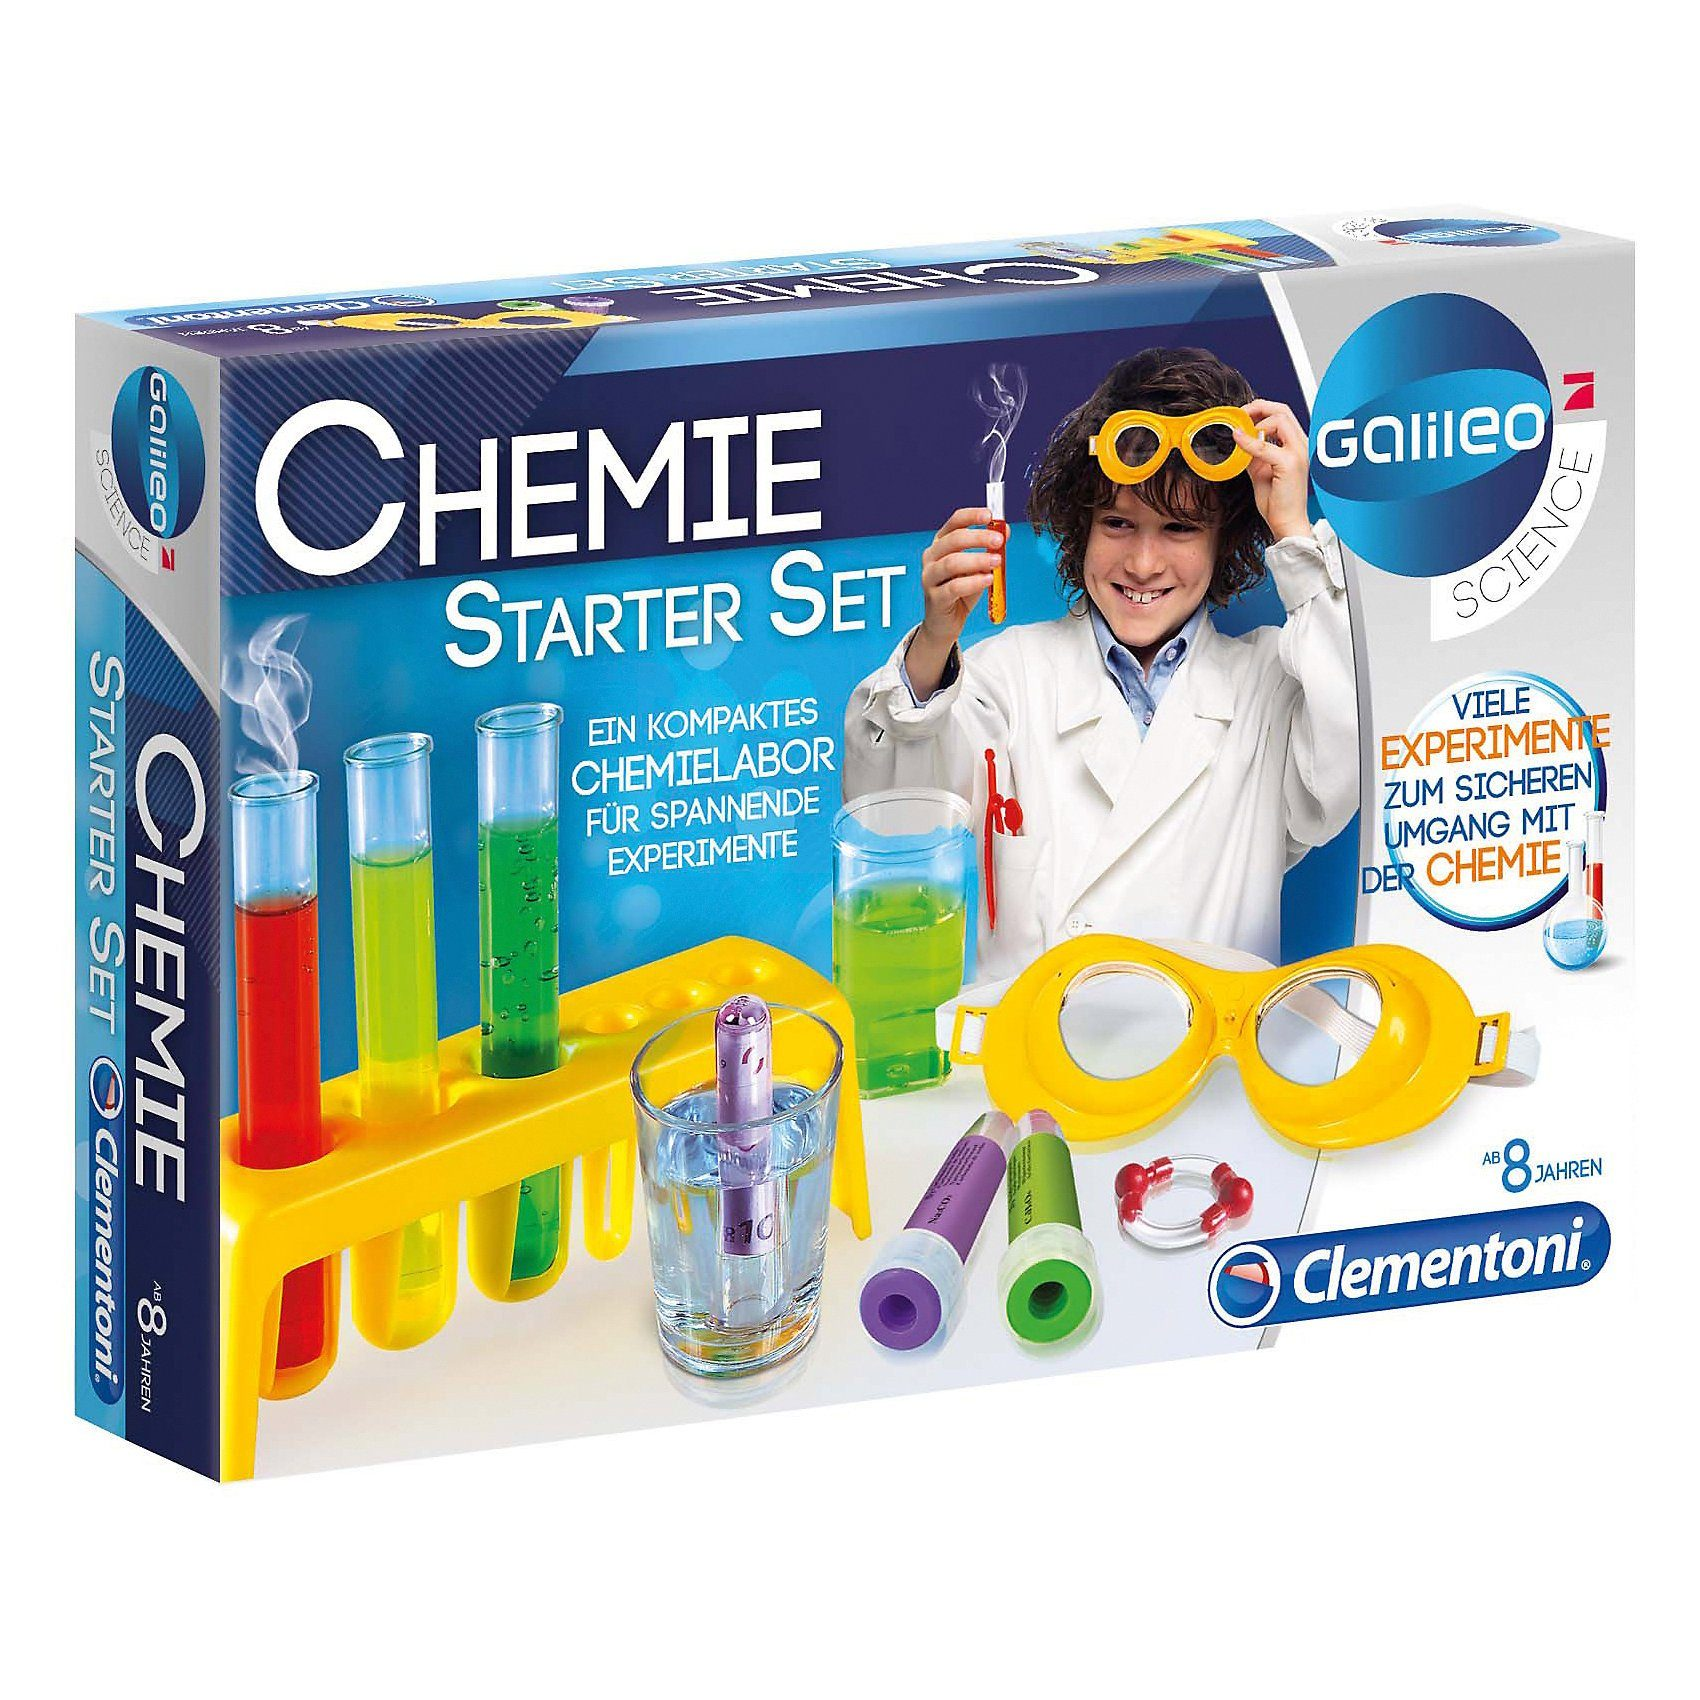 Clementoni Galileo - Chemie Starter Set